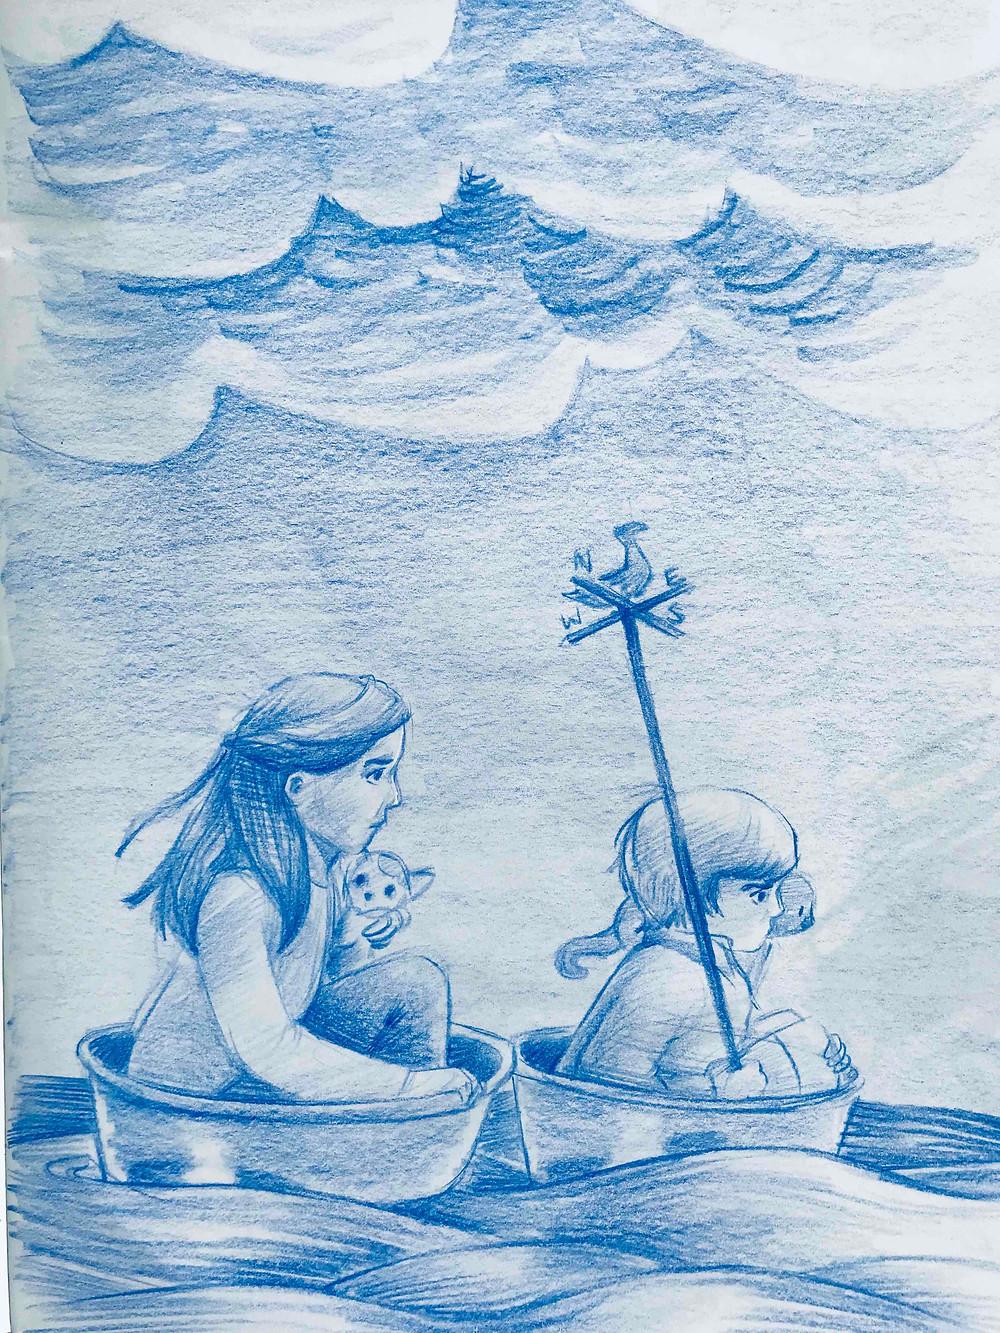 Sketch of two children riding in barrels in the ocean